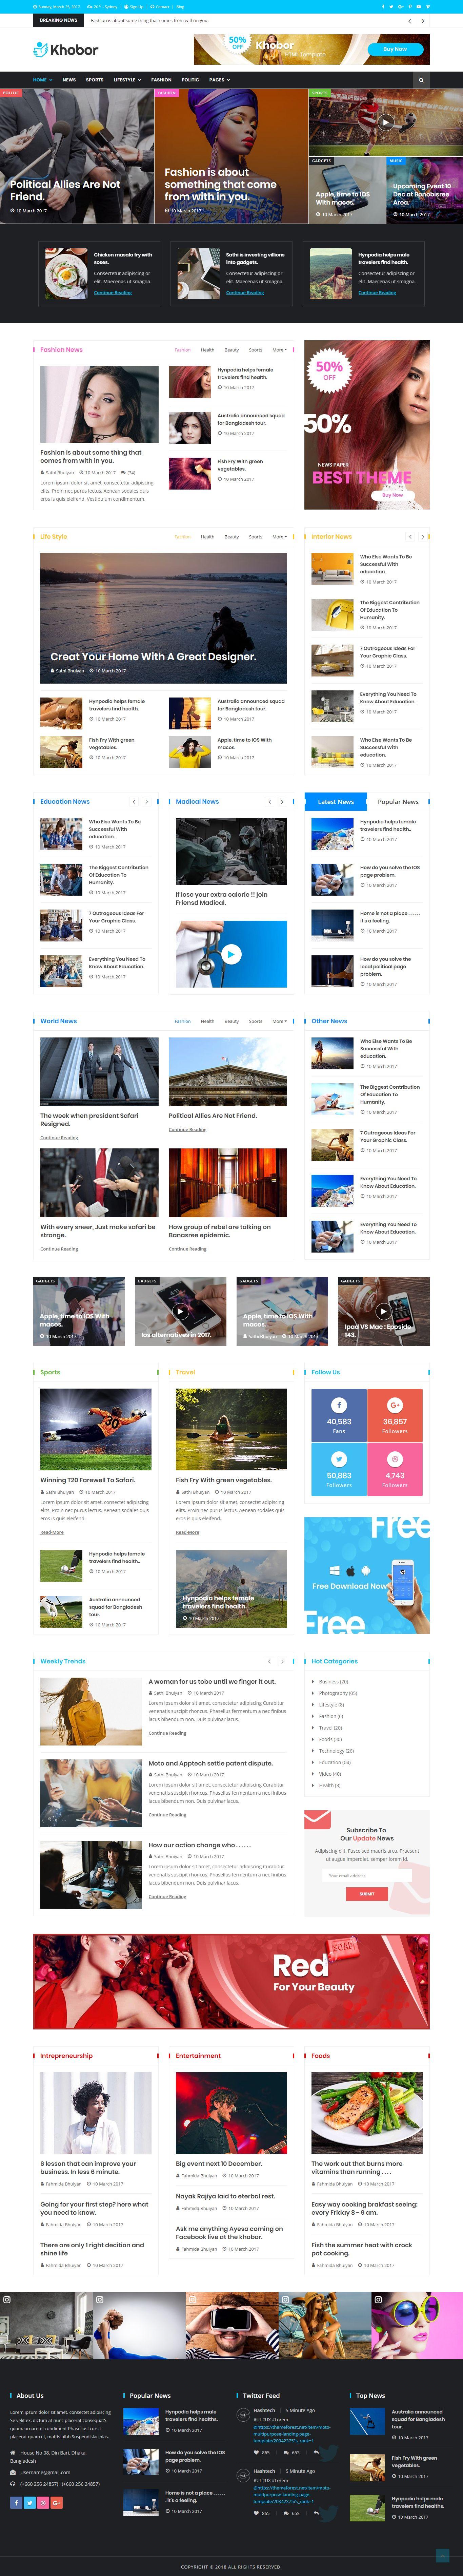 Modern Magazine Newspaper Html Website Template Download Website Template Templates Html Website Templates